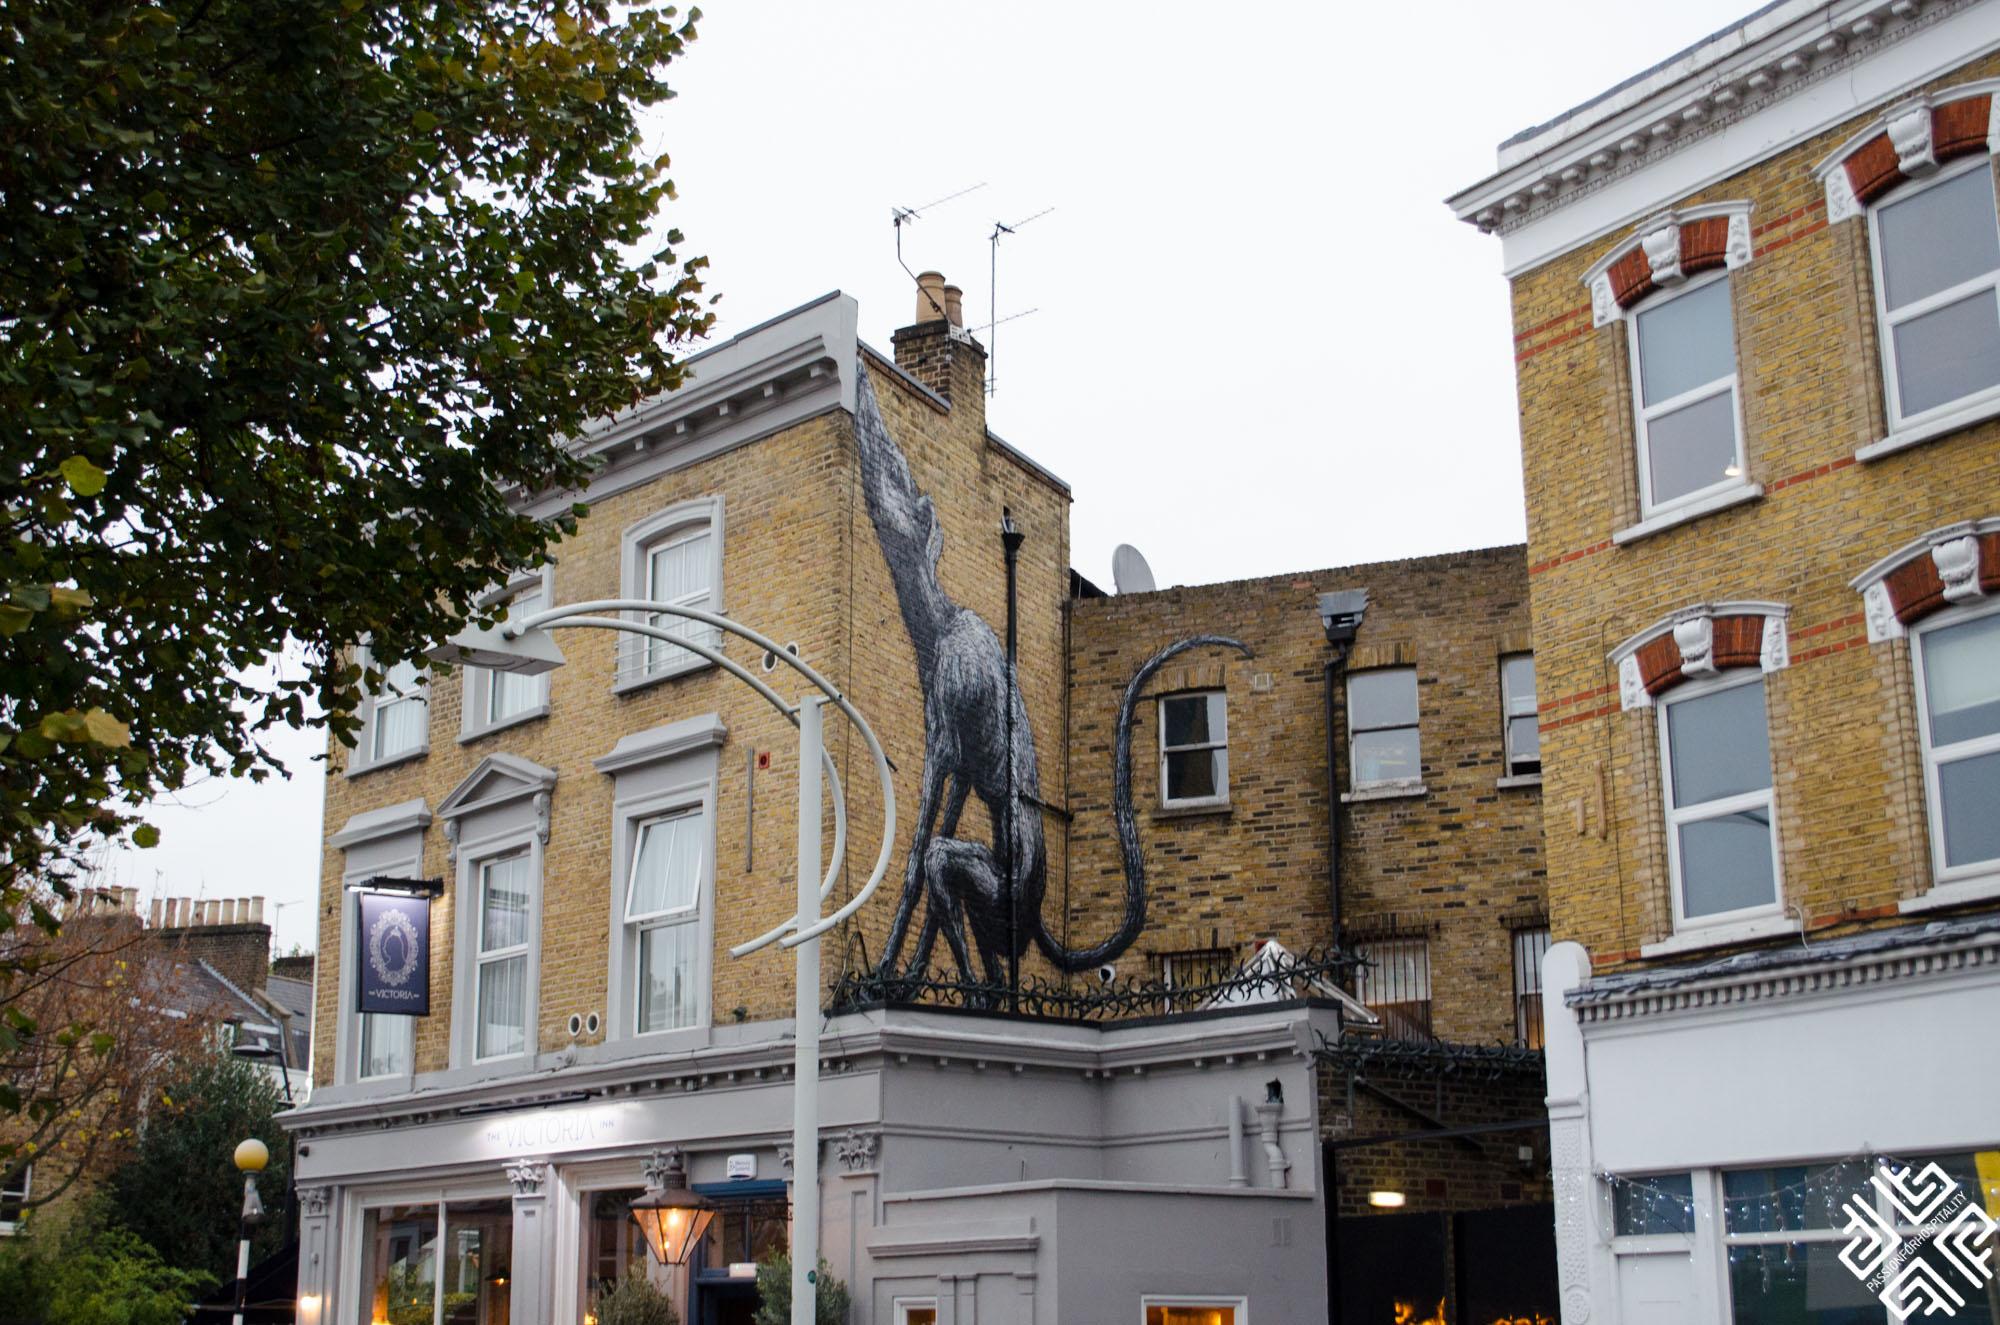 victoria-inn-peckham-boutique-hotel-9